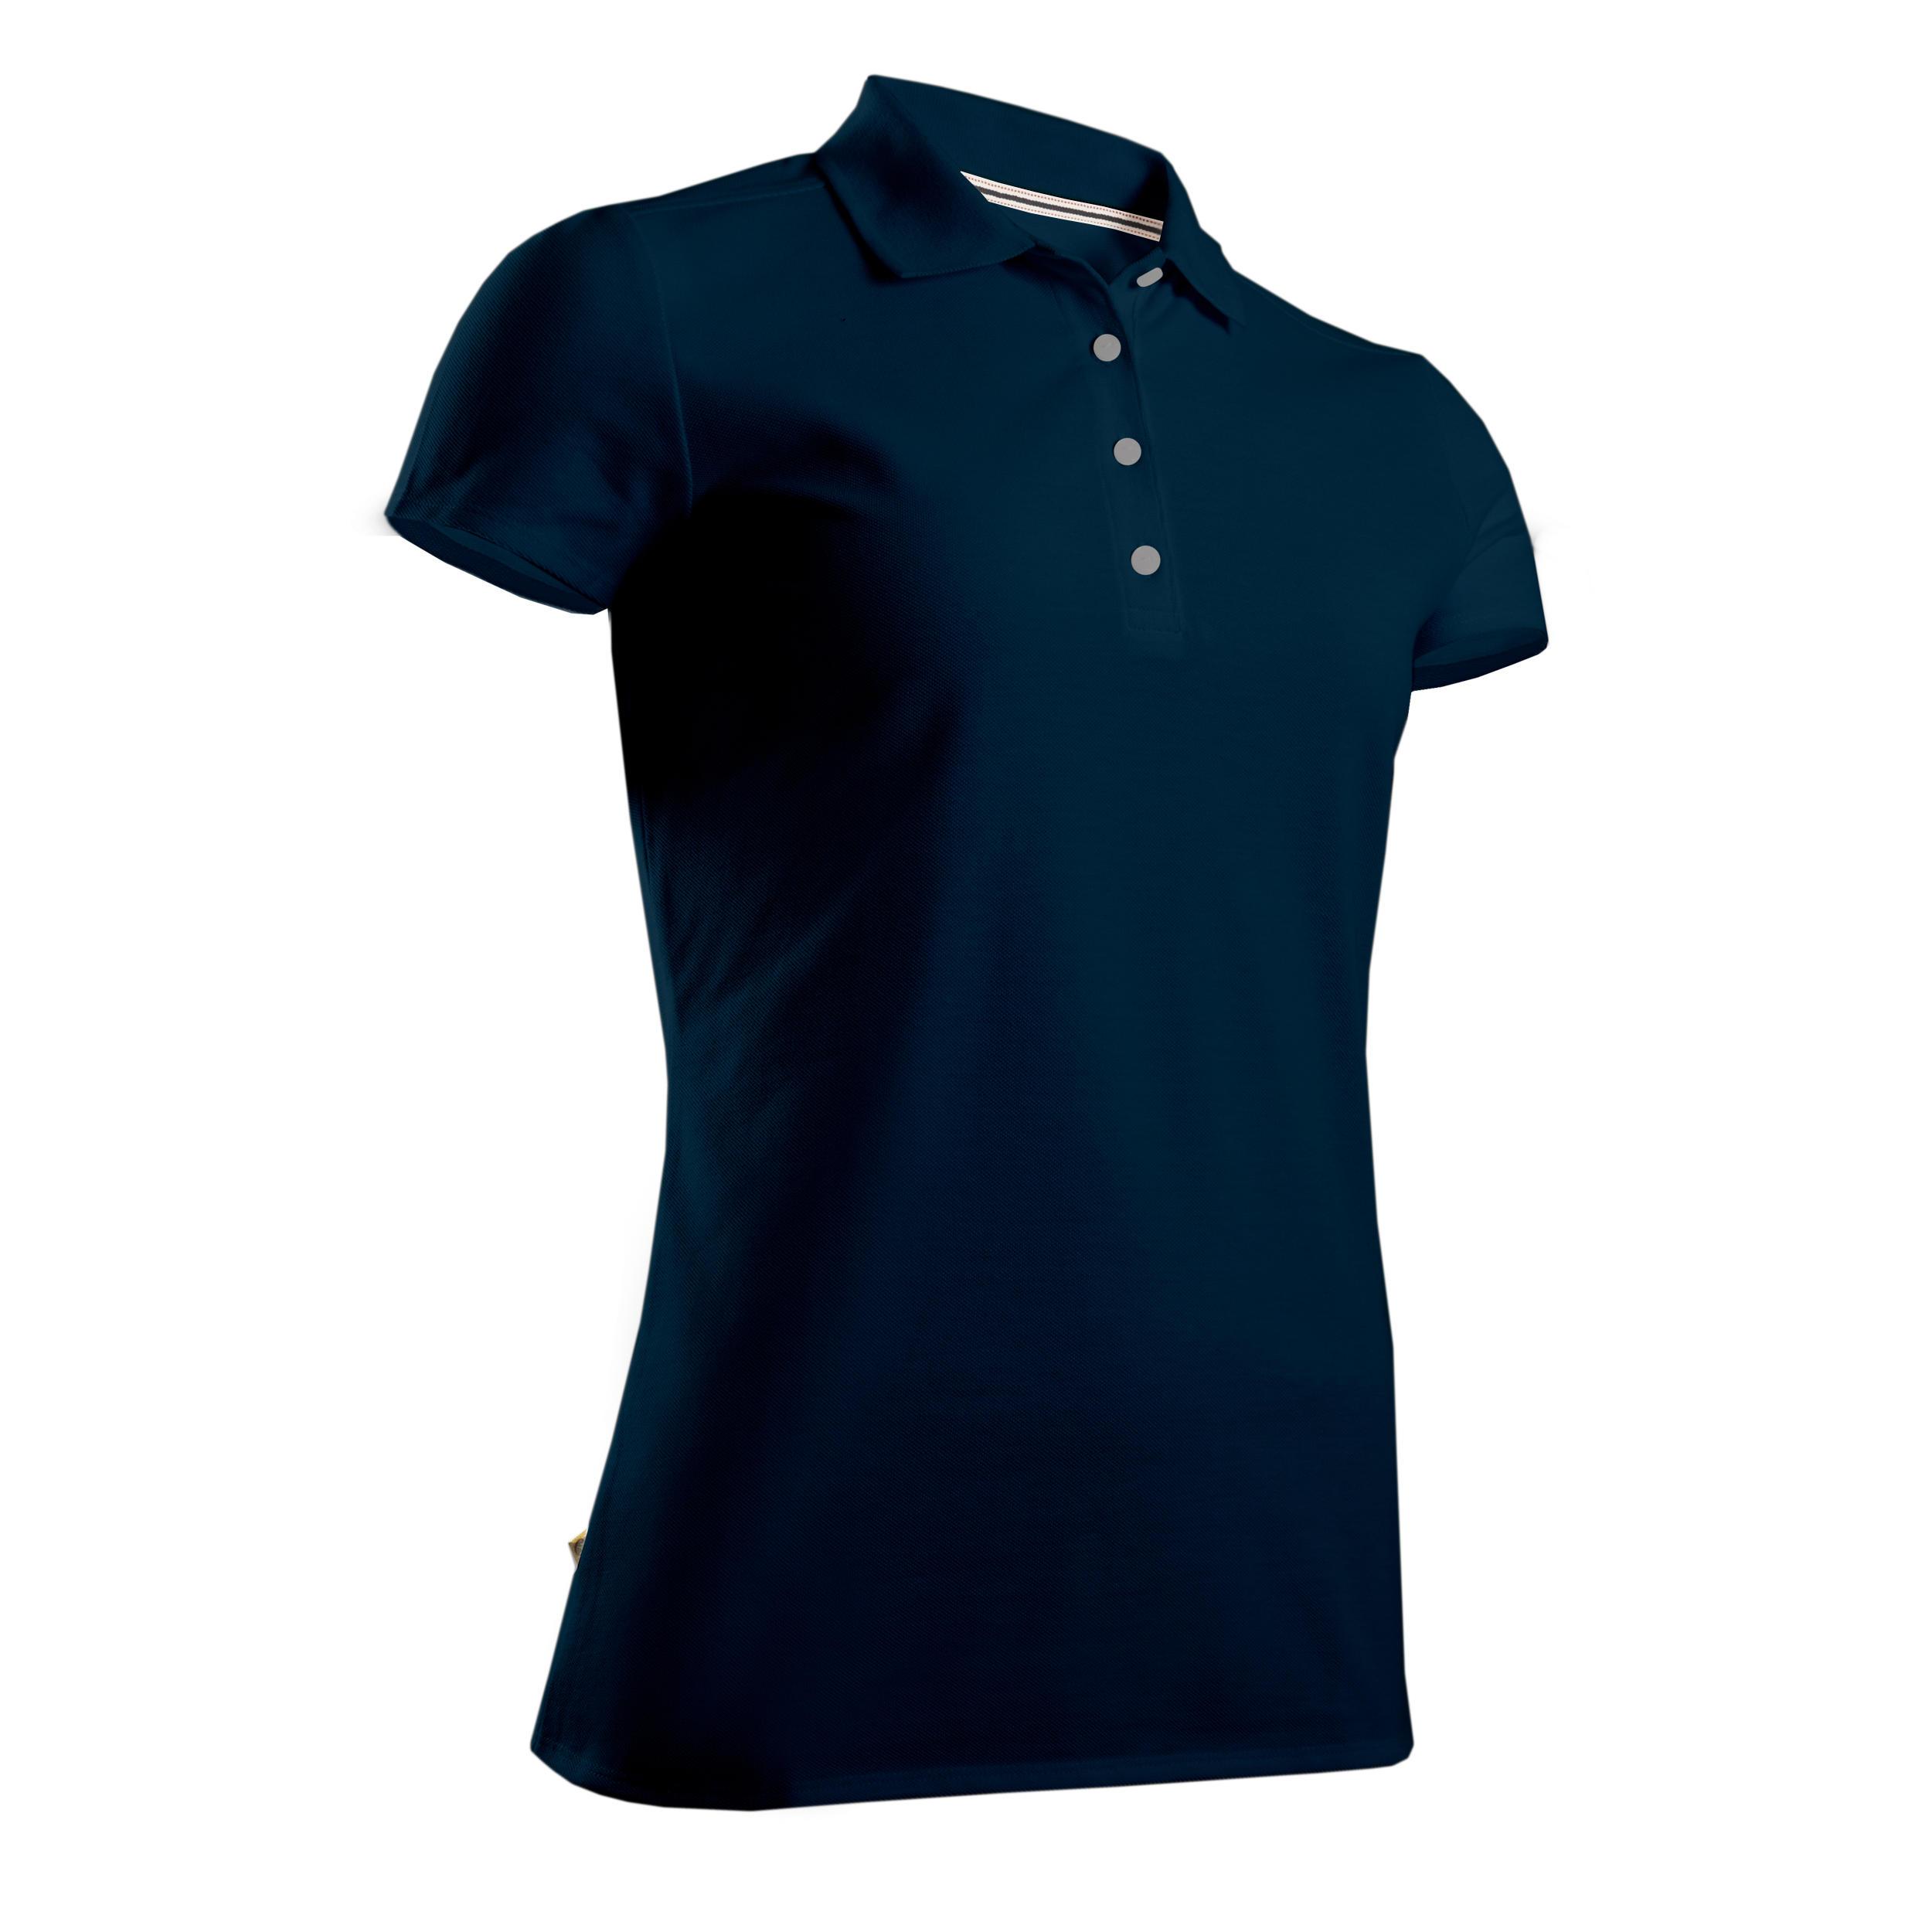 Golf Poloshirt Damen | Bekleidung > Shirts > Poloshirts | Inesis